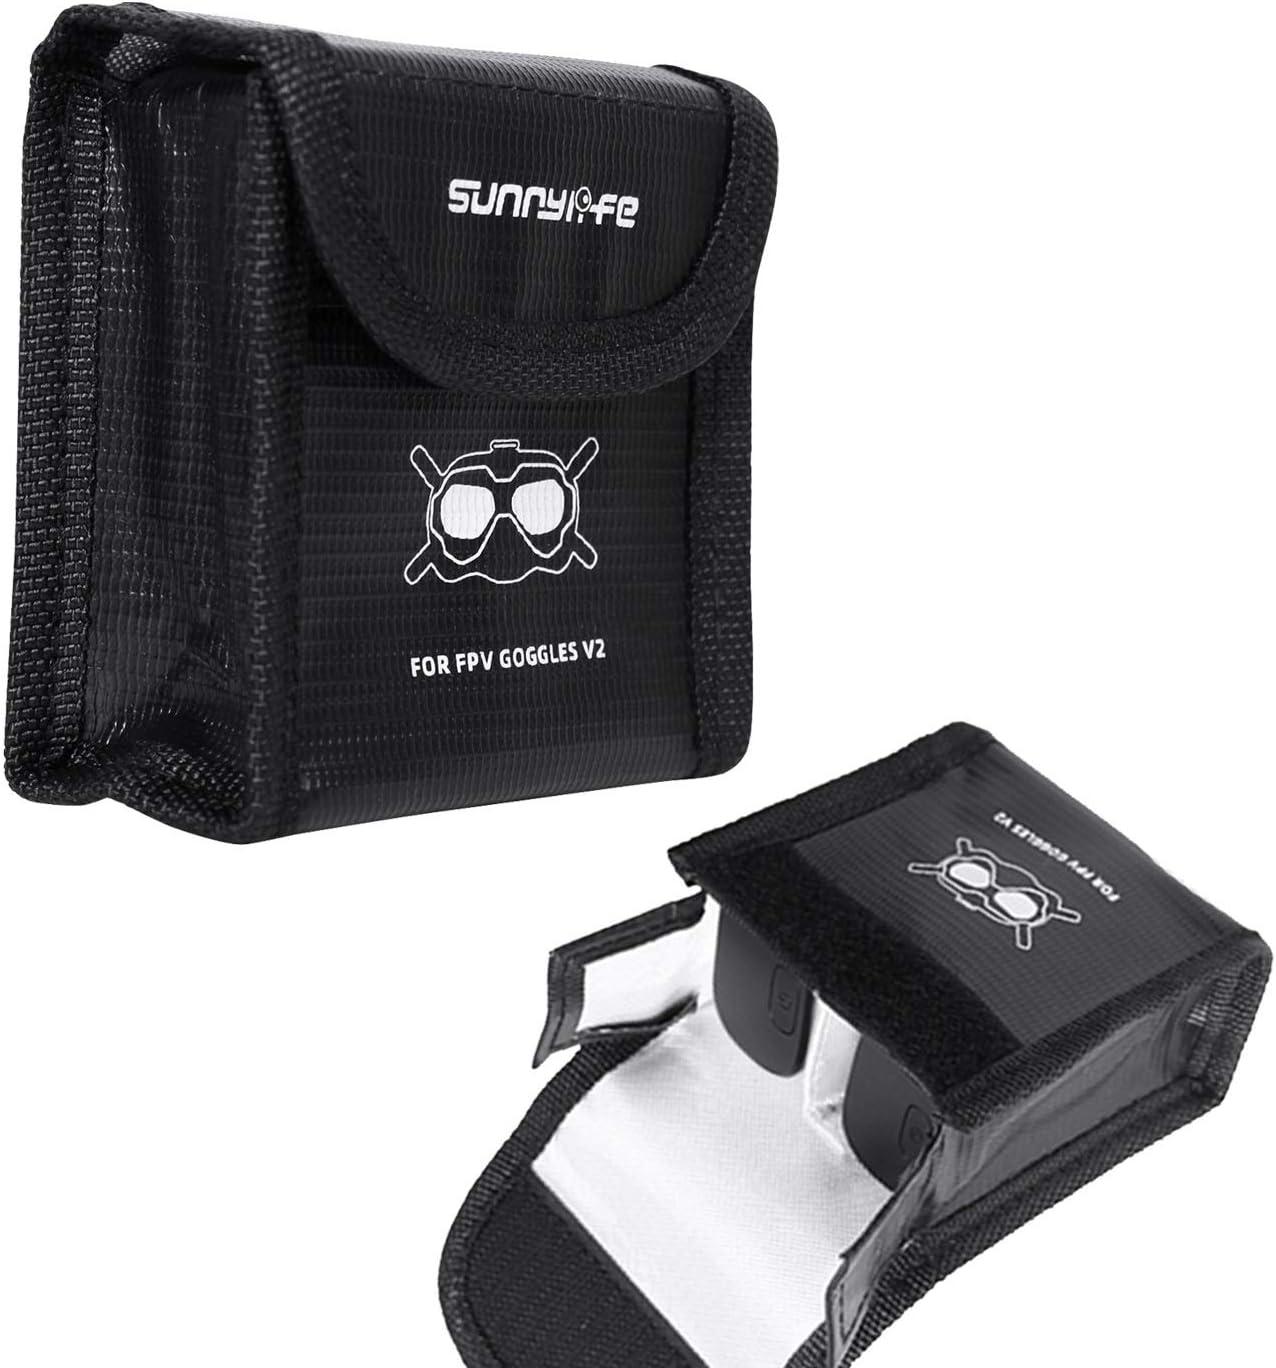 M Pochette de Protection antid/éflagrante pour Batterie Tineer Nylon Lipo Bag Battery Case Safe Storage pour DJI FPV Goggles V2 Batteries